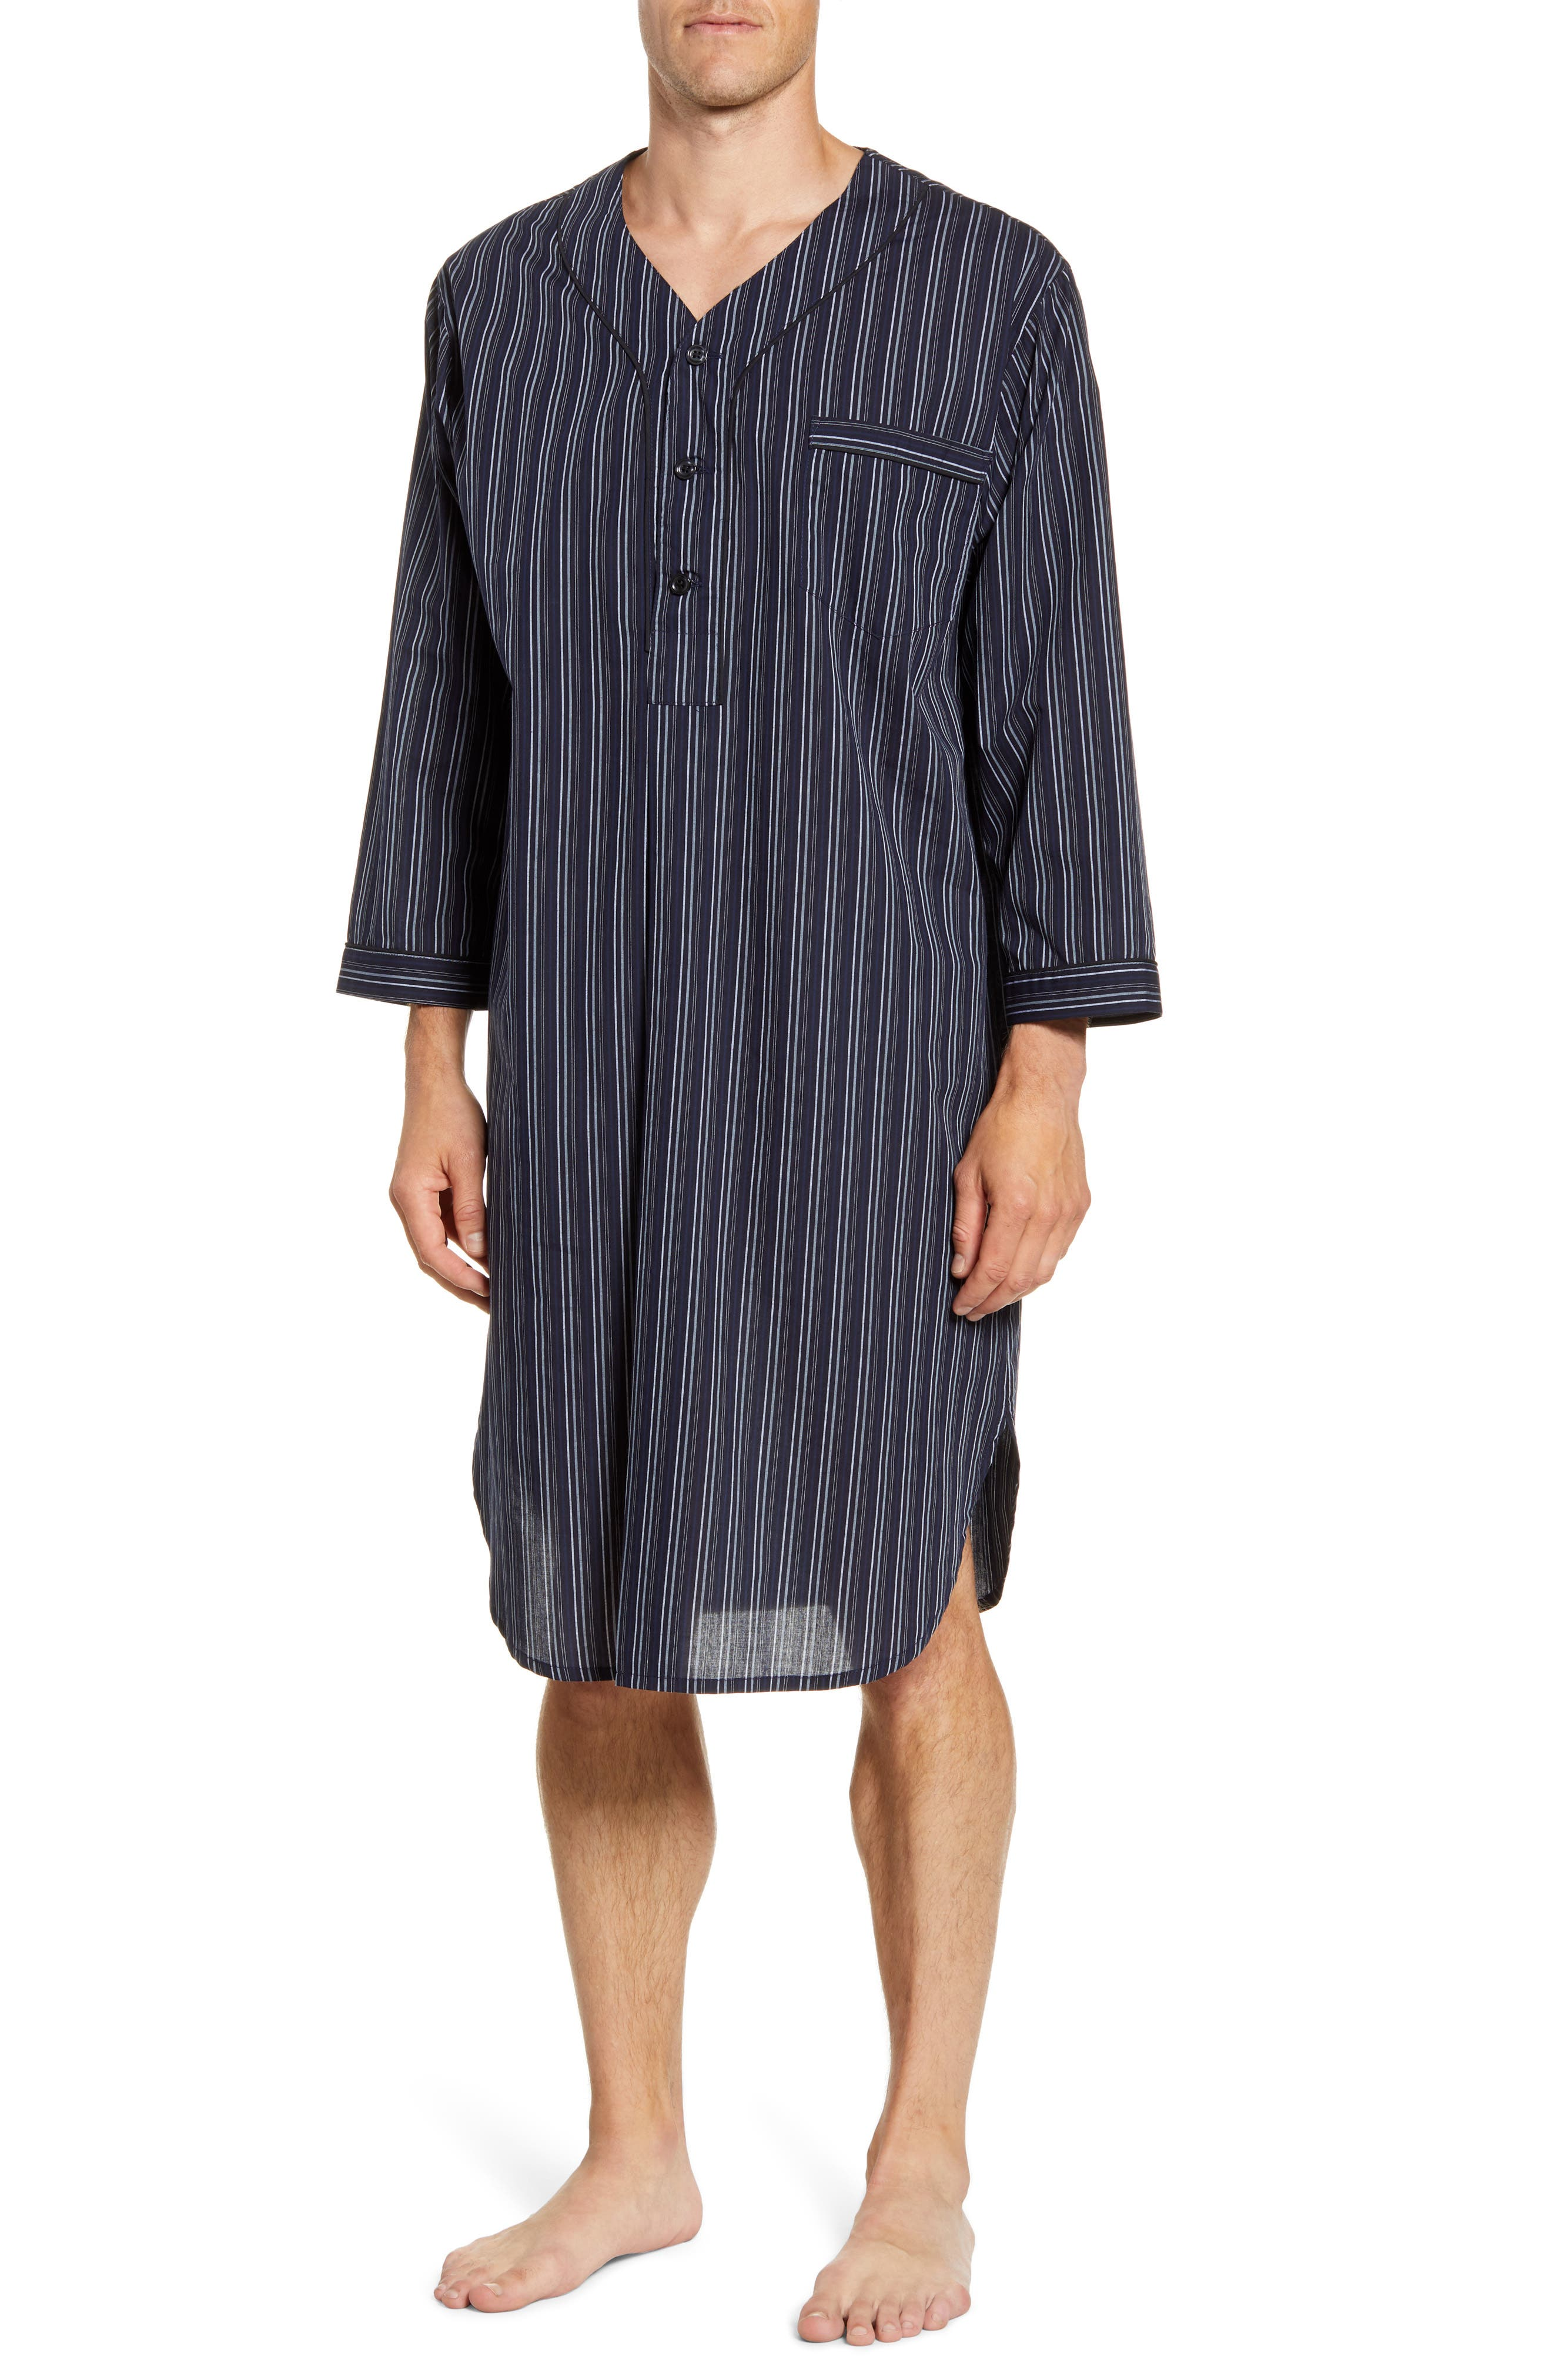 1940s Men's Underwear: Briefs, Boxers, Unions, & Socks Mens Big  Tall Majestic International Bar Blues Cotton Blend Nightshirt $65.00 AT vintagedancer.com